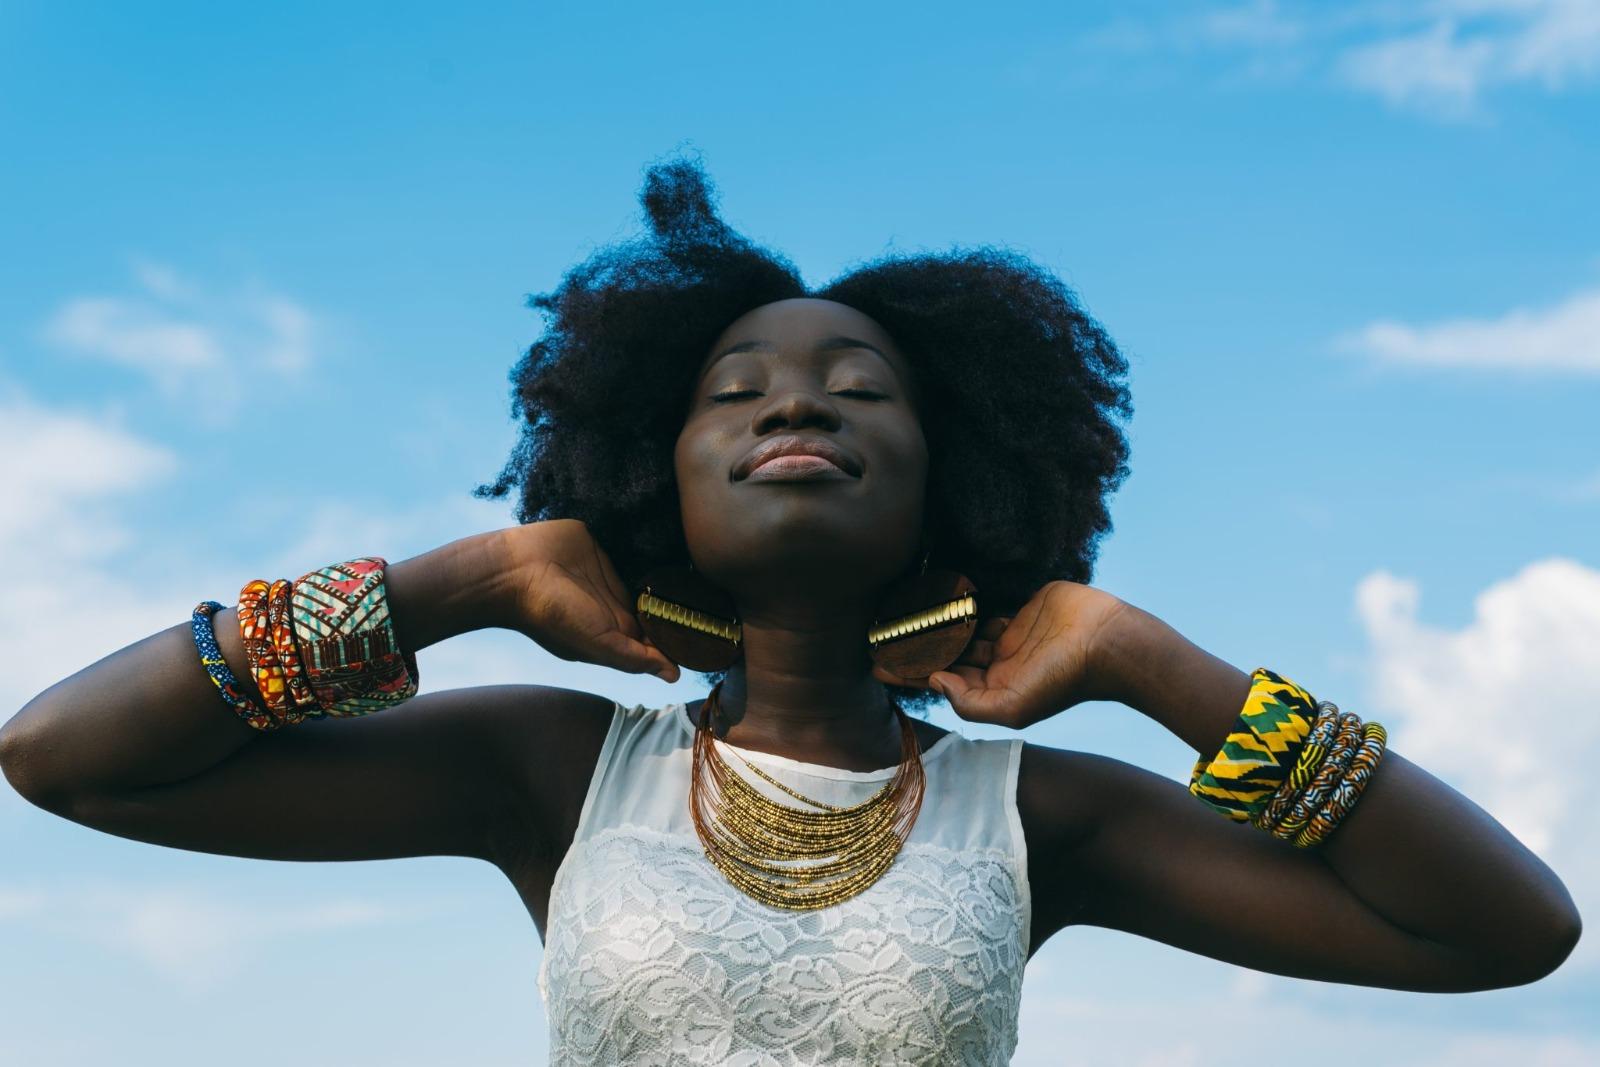 WhatsApp Image 2020 01 09 at 17.55.59 - Cortes de cabelo feminino 2020: tendências para cacheados e crespos